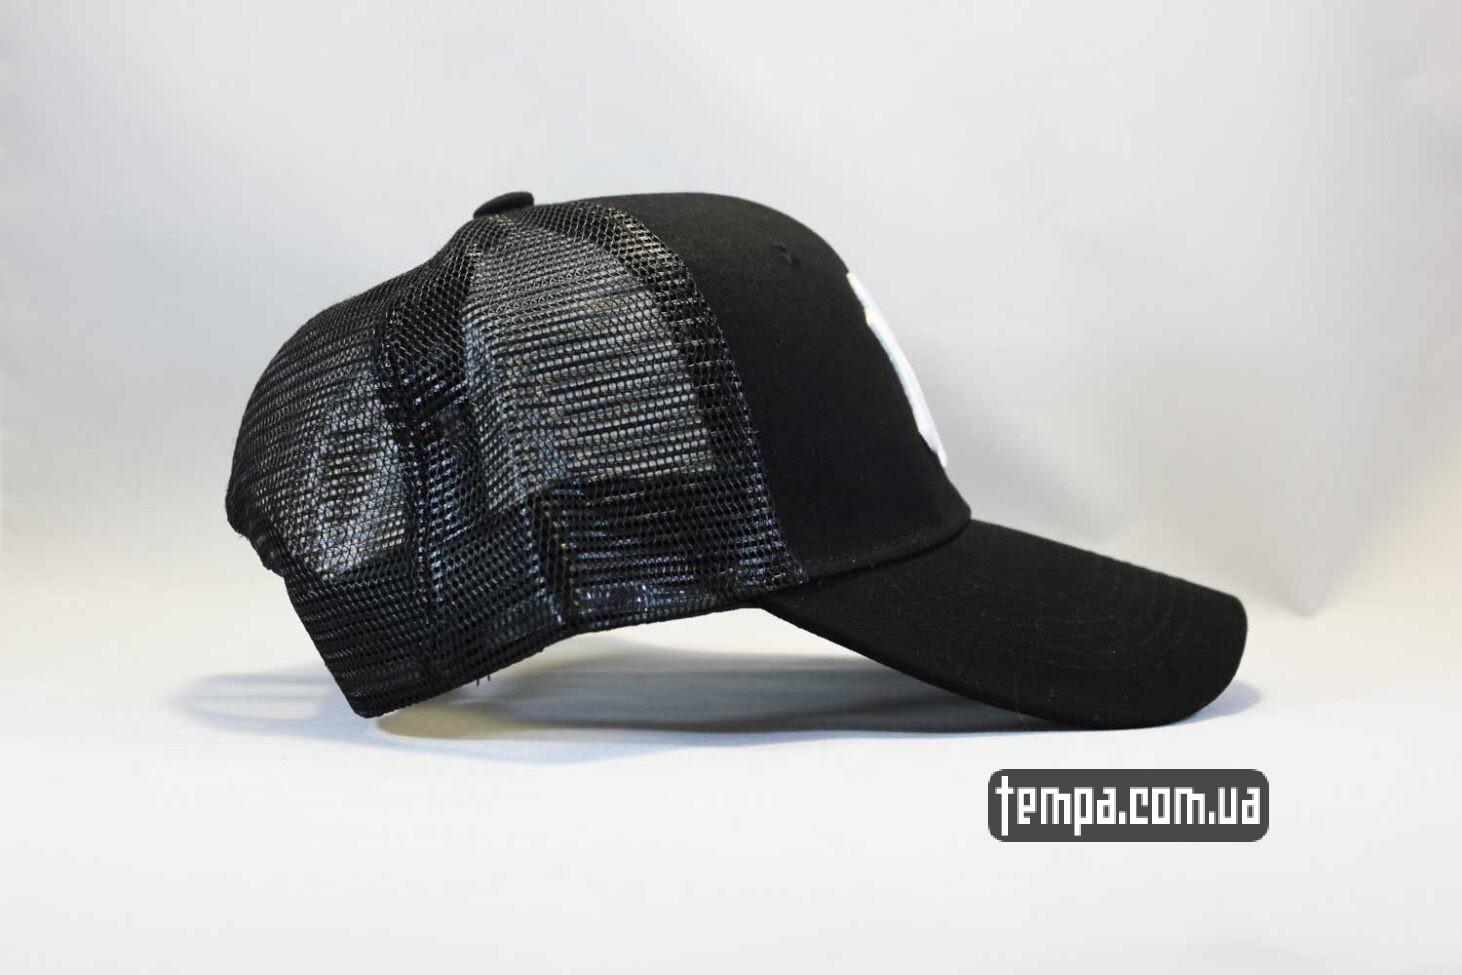 нью йорк одежда кепка бейсболка Trucker NY New York Yankees черная сеточка